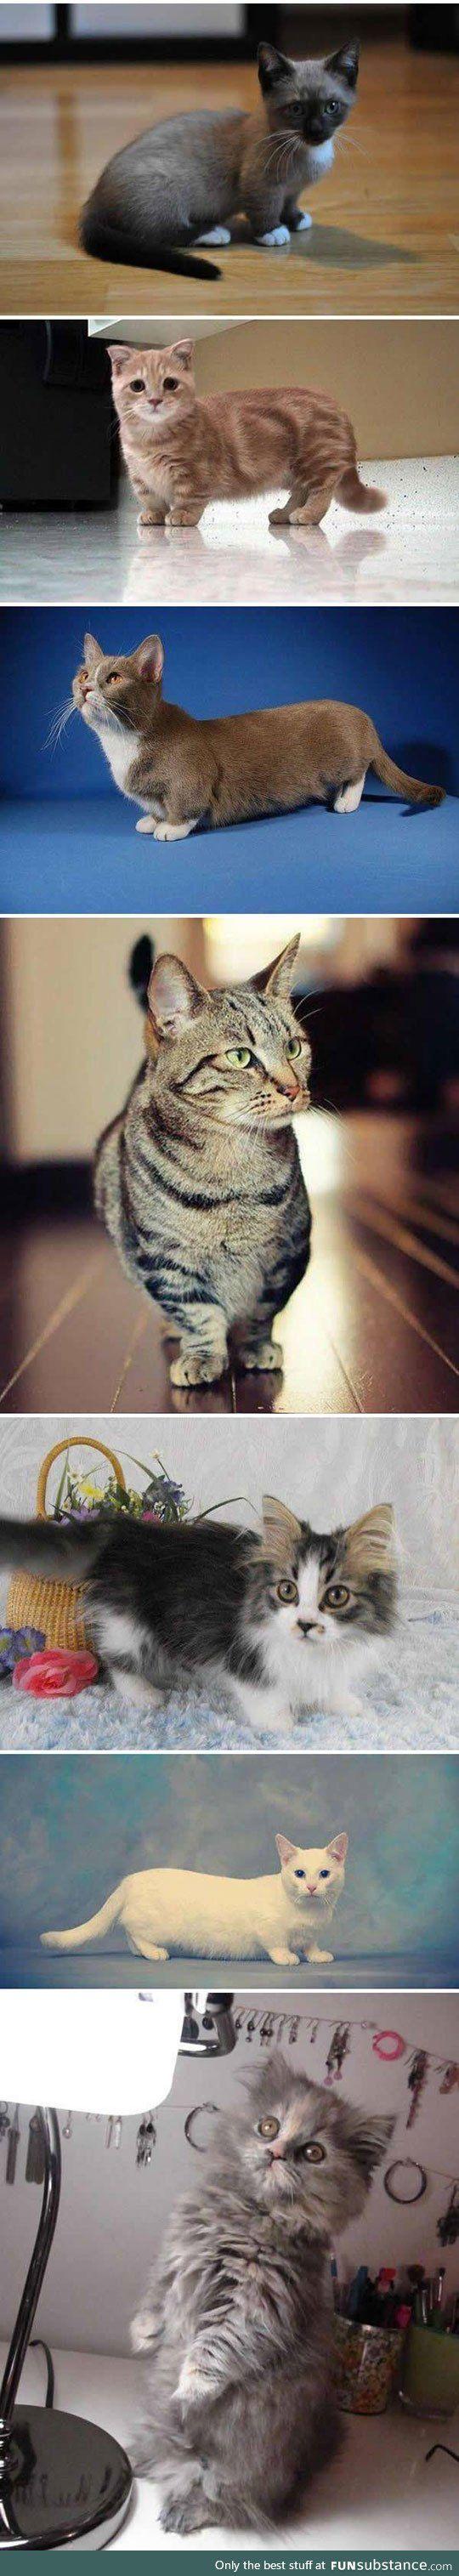 Short legged cats are like corgis